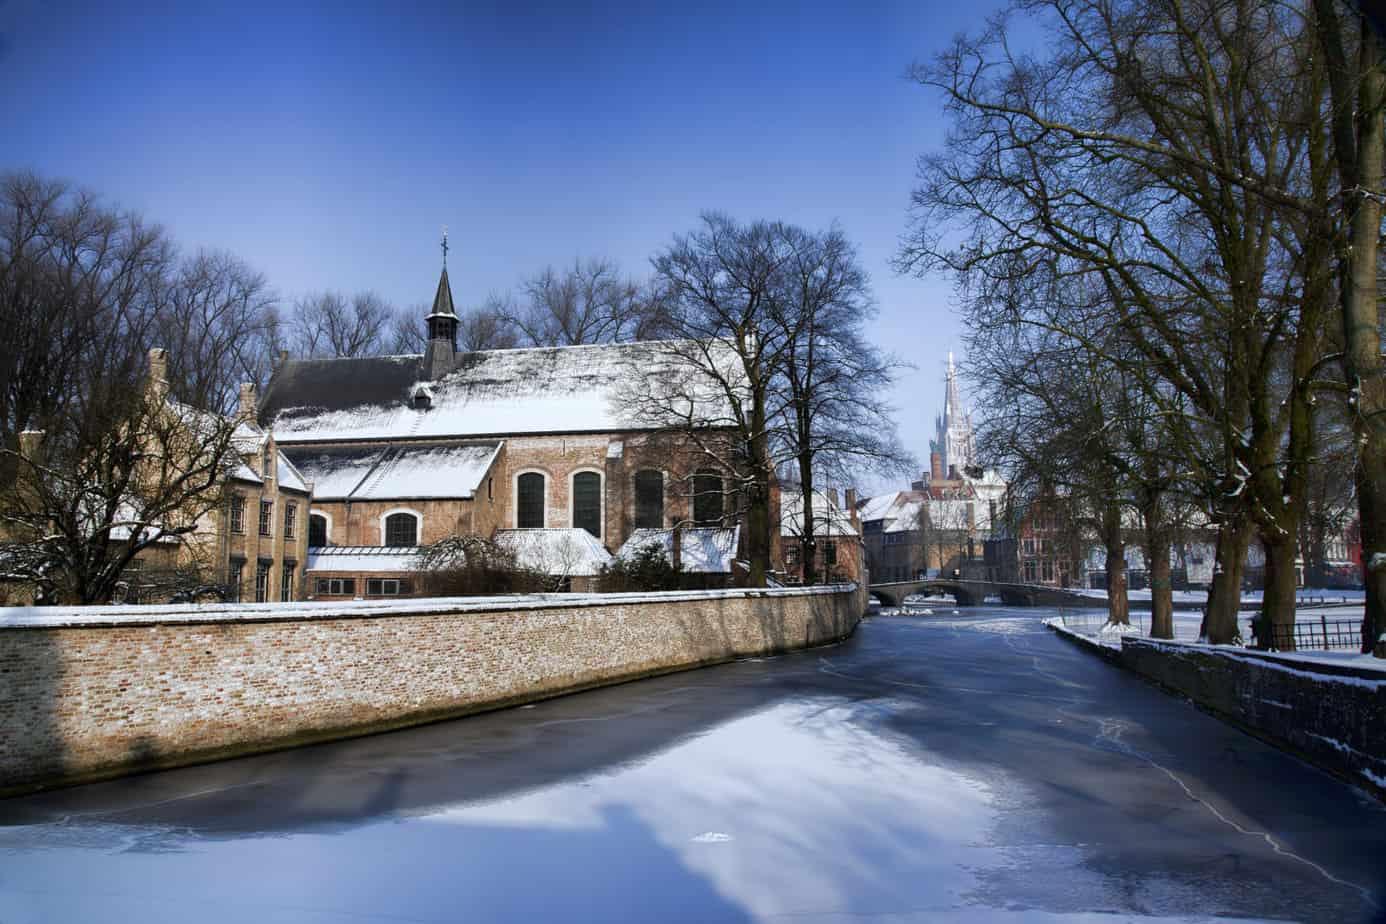 Brugge winter